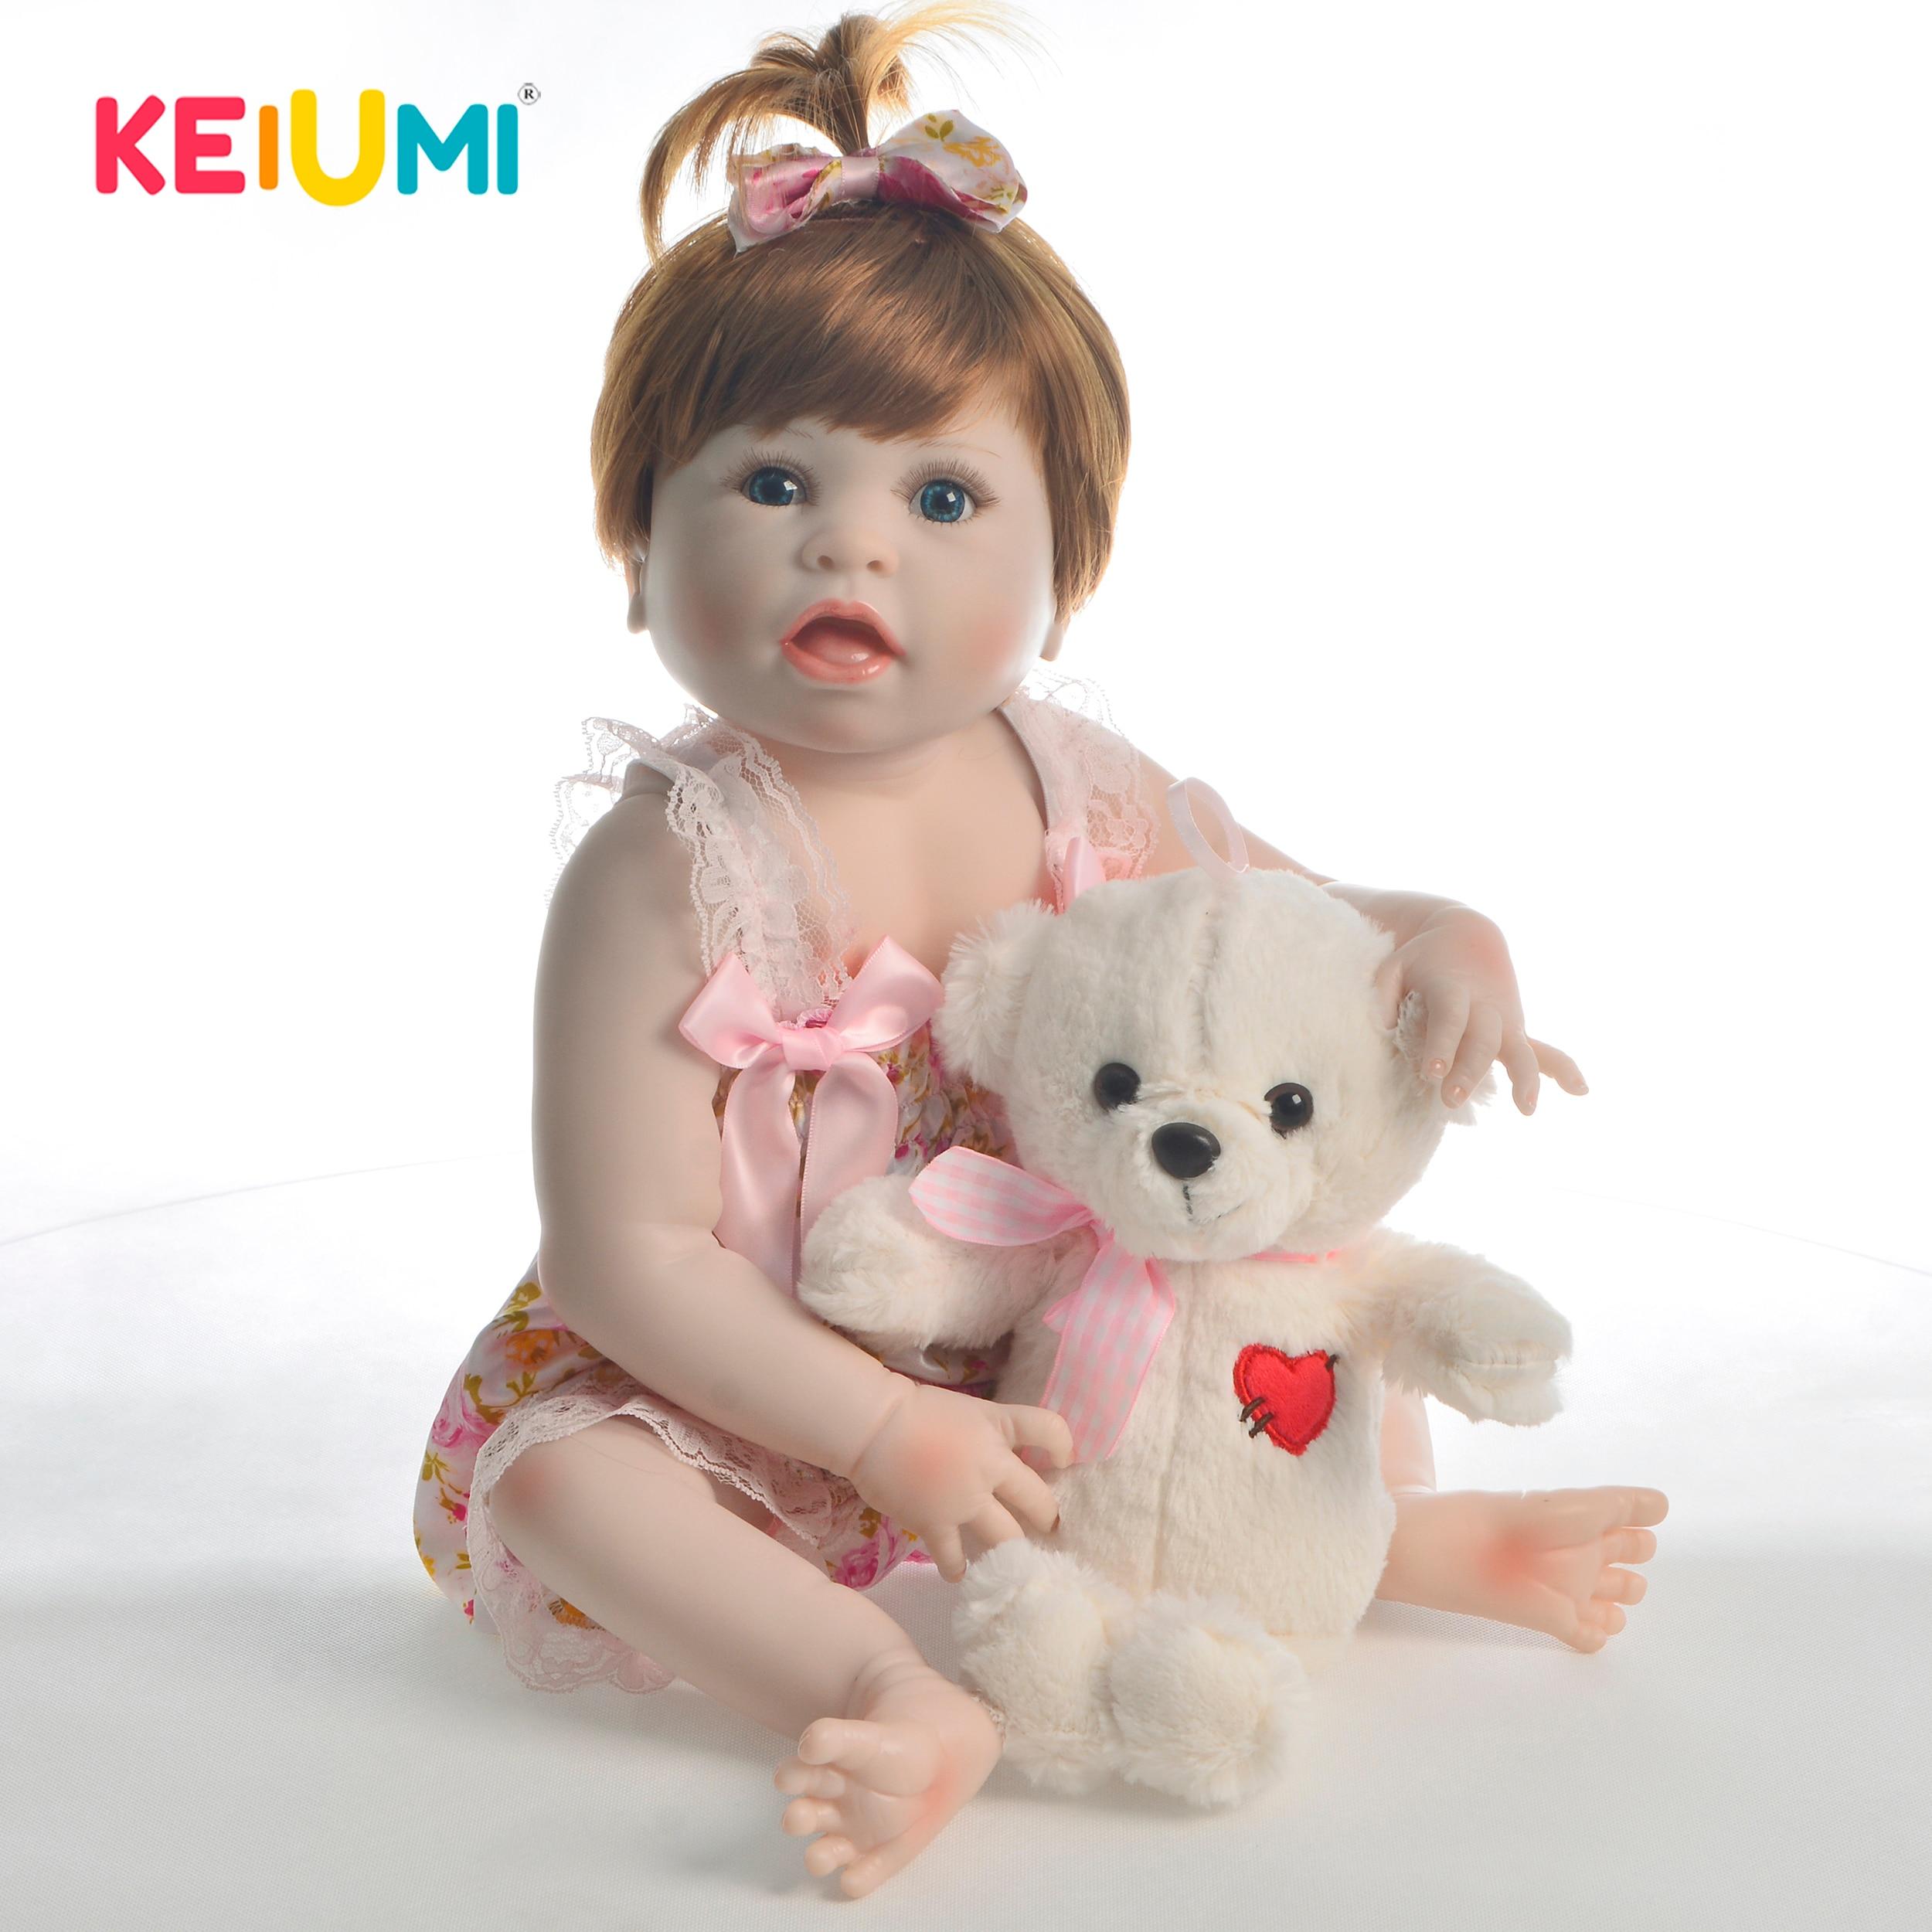 Handmade Reborn Baby Dolls Toys 23 57 cm Full Silicone Vinyl Body Simulation Reborn Babies Fashion